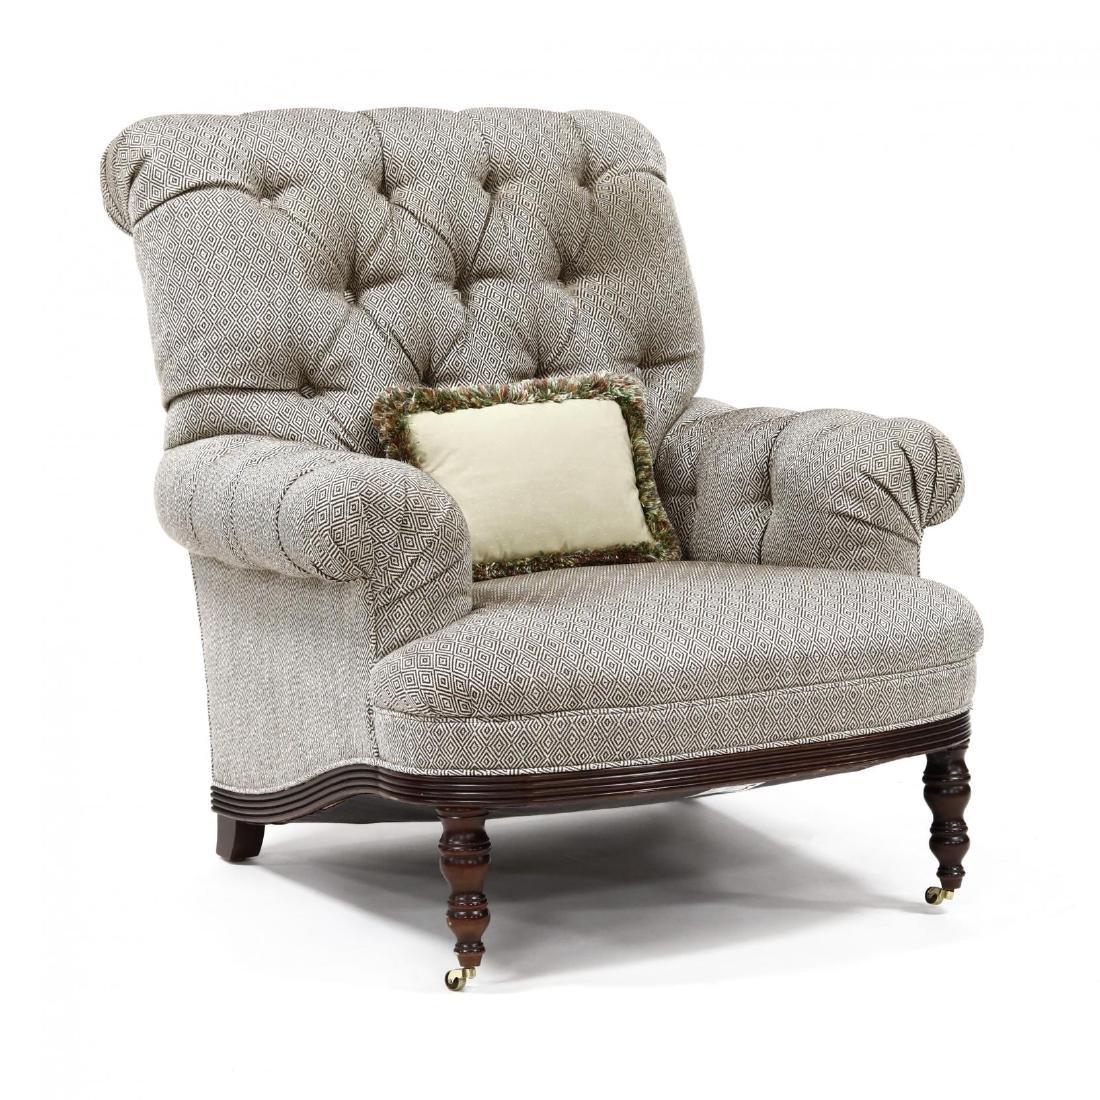 Baker, Overupholstered Library Chair